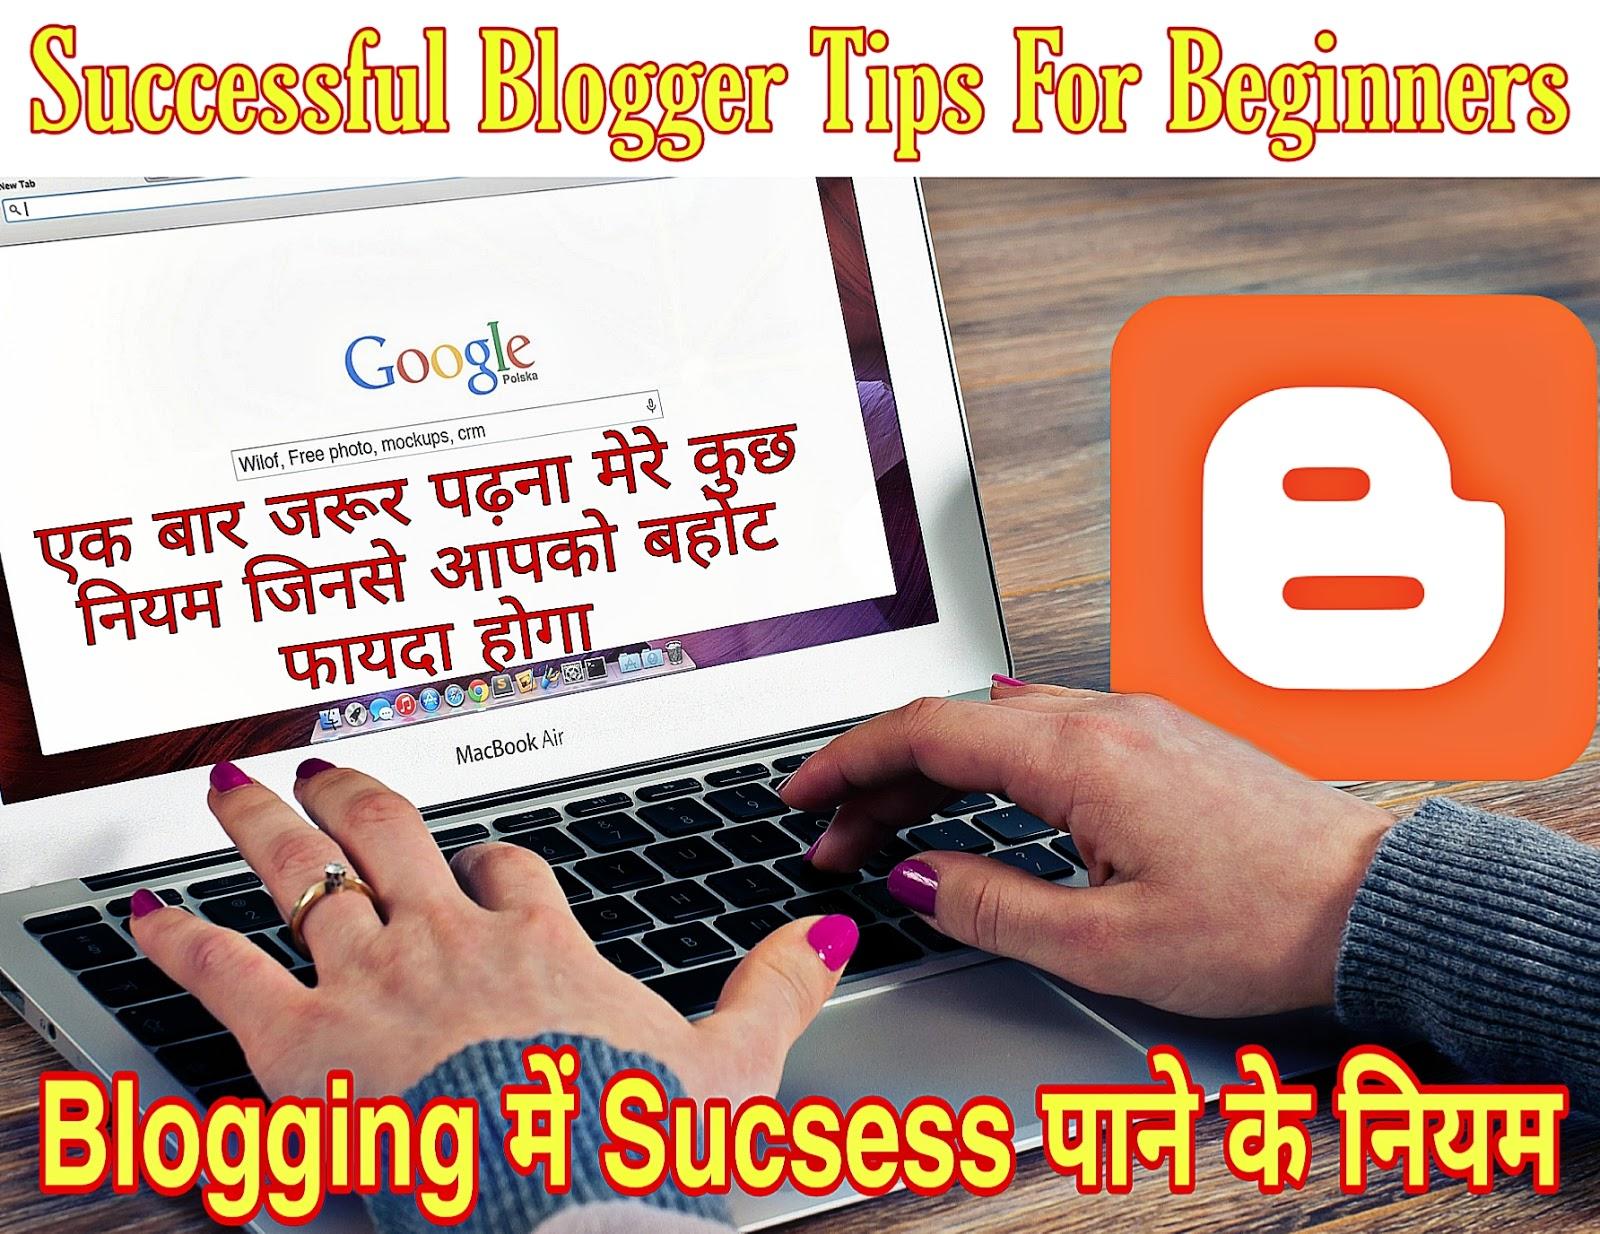 2020 Blogging Me Safalta Pane Ke Kuchh Niyam | Successful Blogging Tips For Beginners 2020